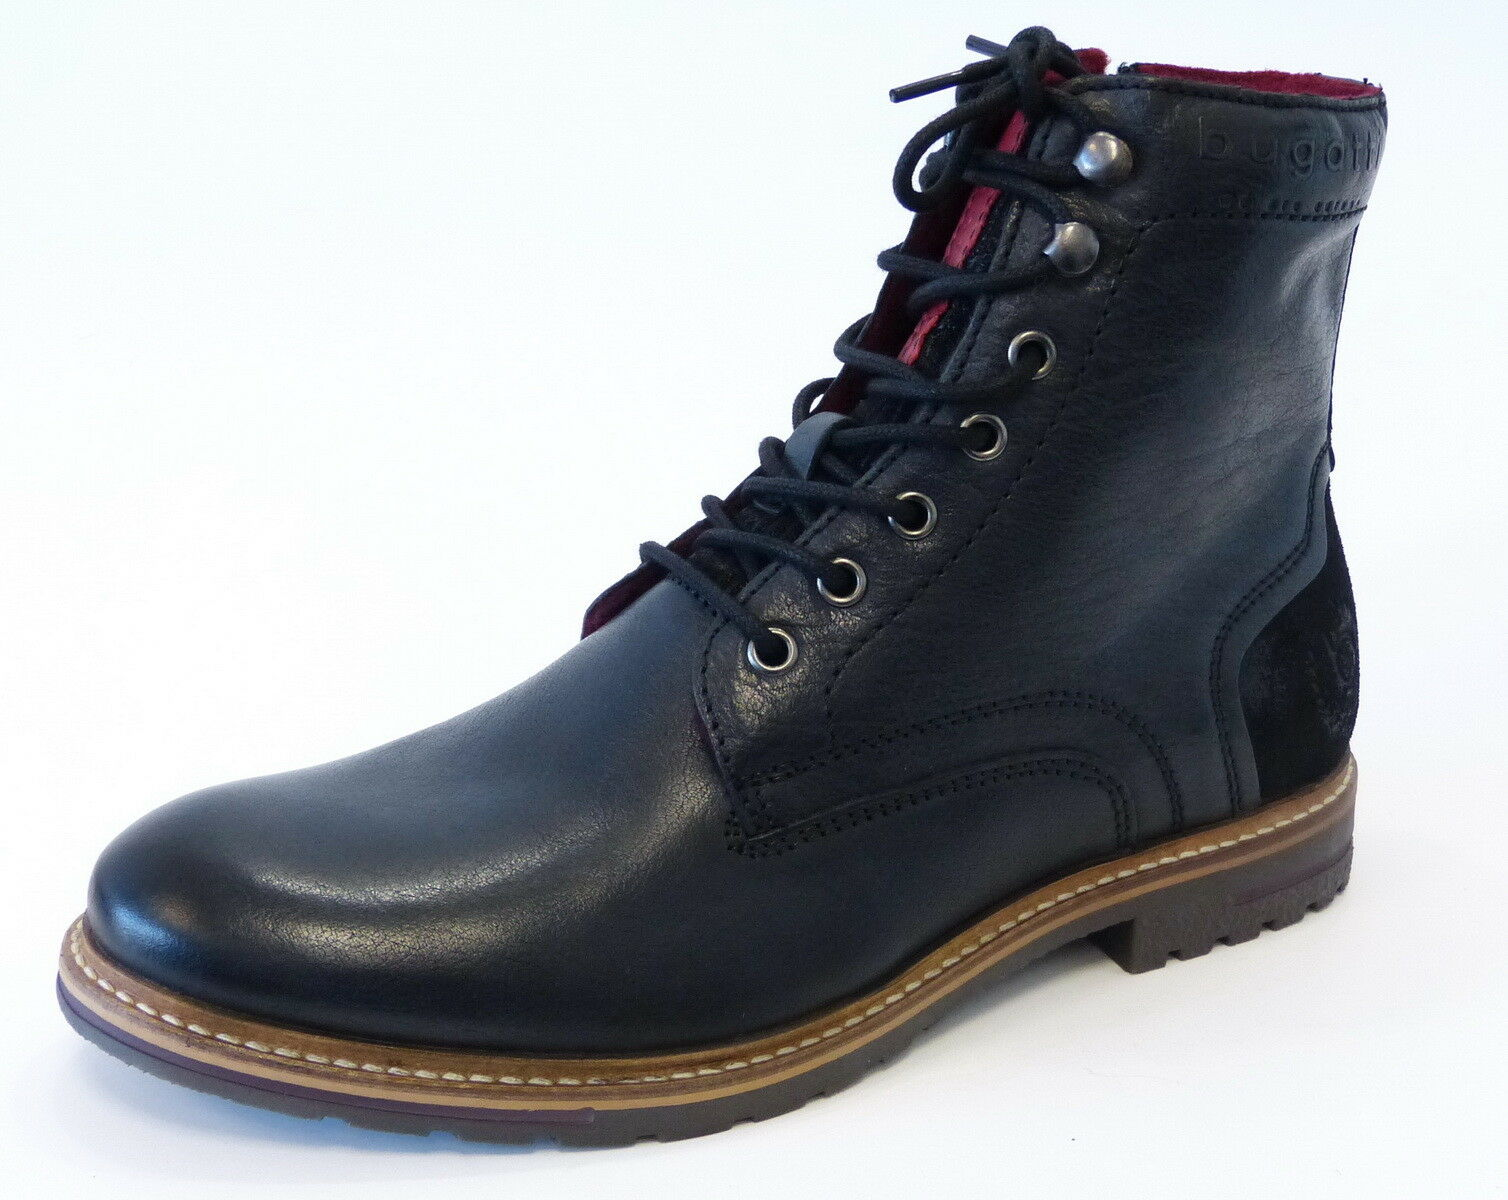 adidas CF Advantage Cloudfoam Blanc Navy Hommes Hommes Navy Casual Chaussures Baskets B43648 e556a3